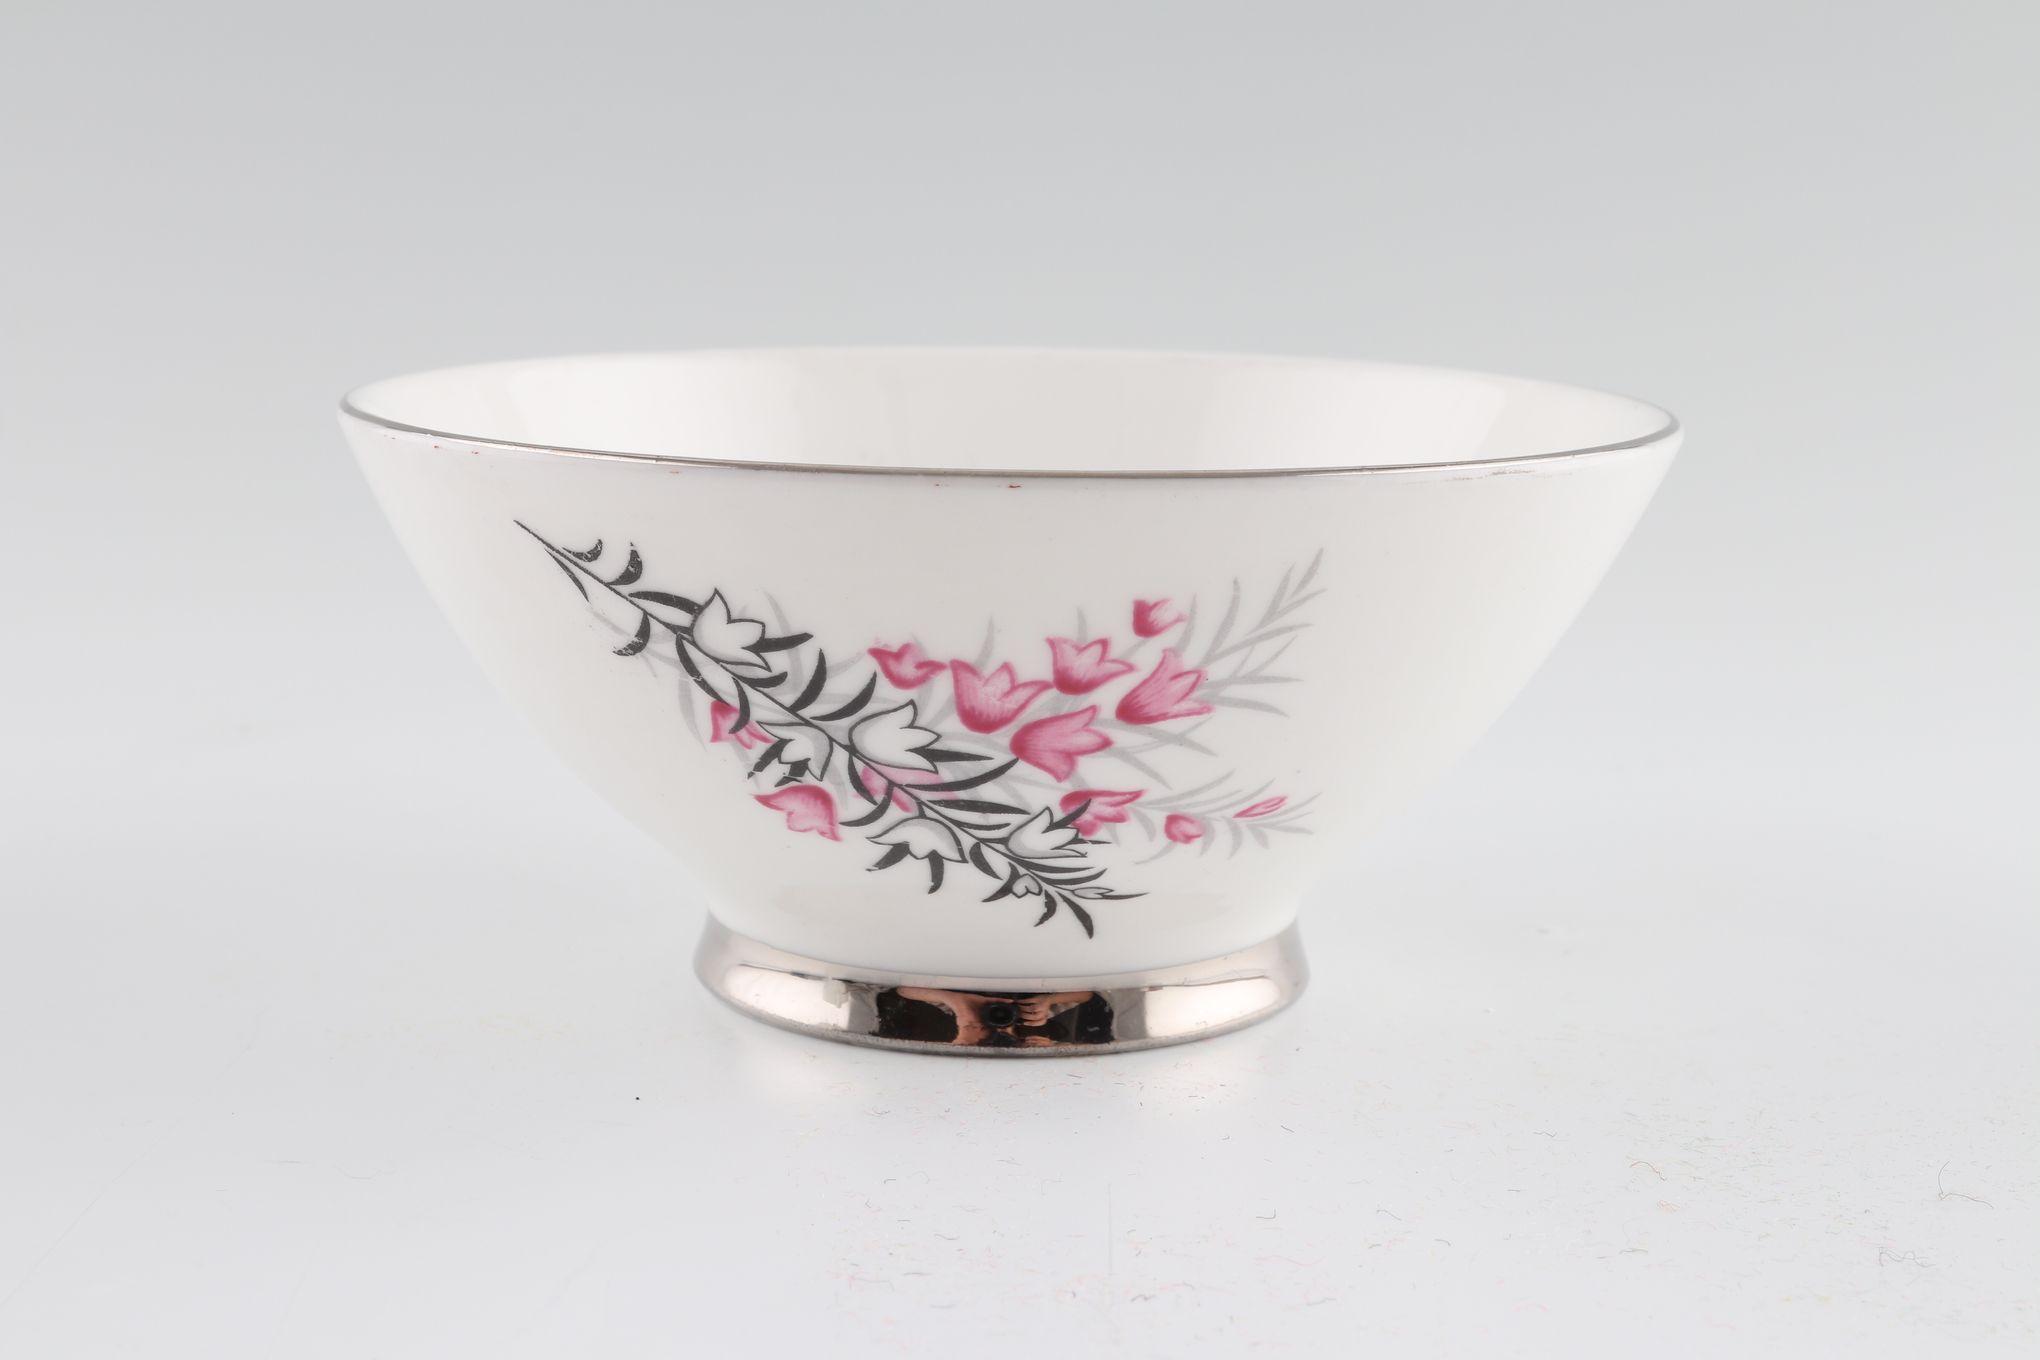 "Royal Albert Pixie Pink Sugar Bowl - Open (Tea) plain rim 4 5/8"" thumb 1"